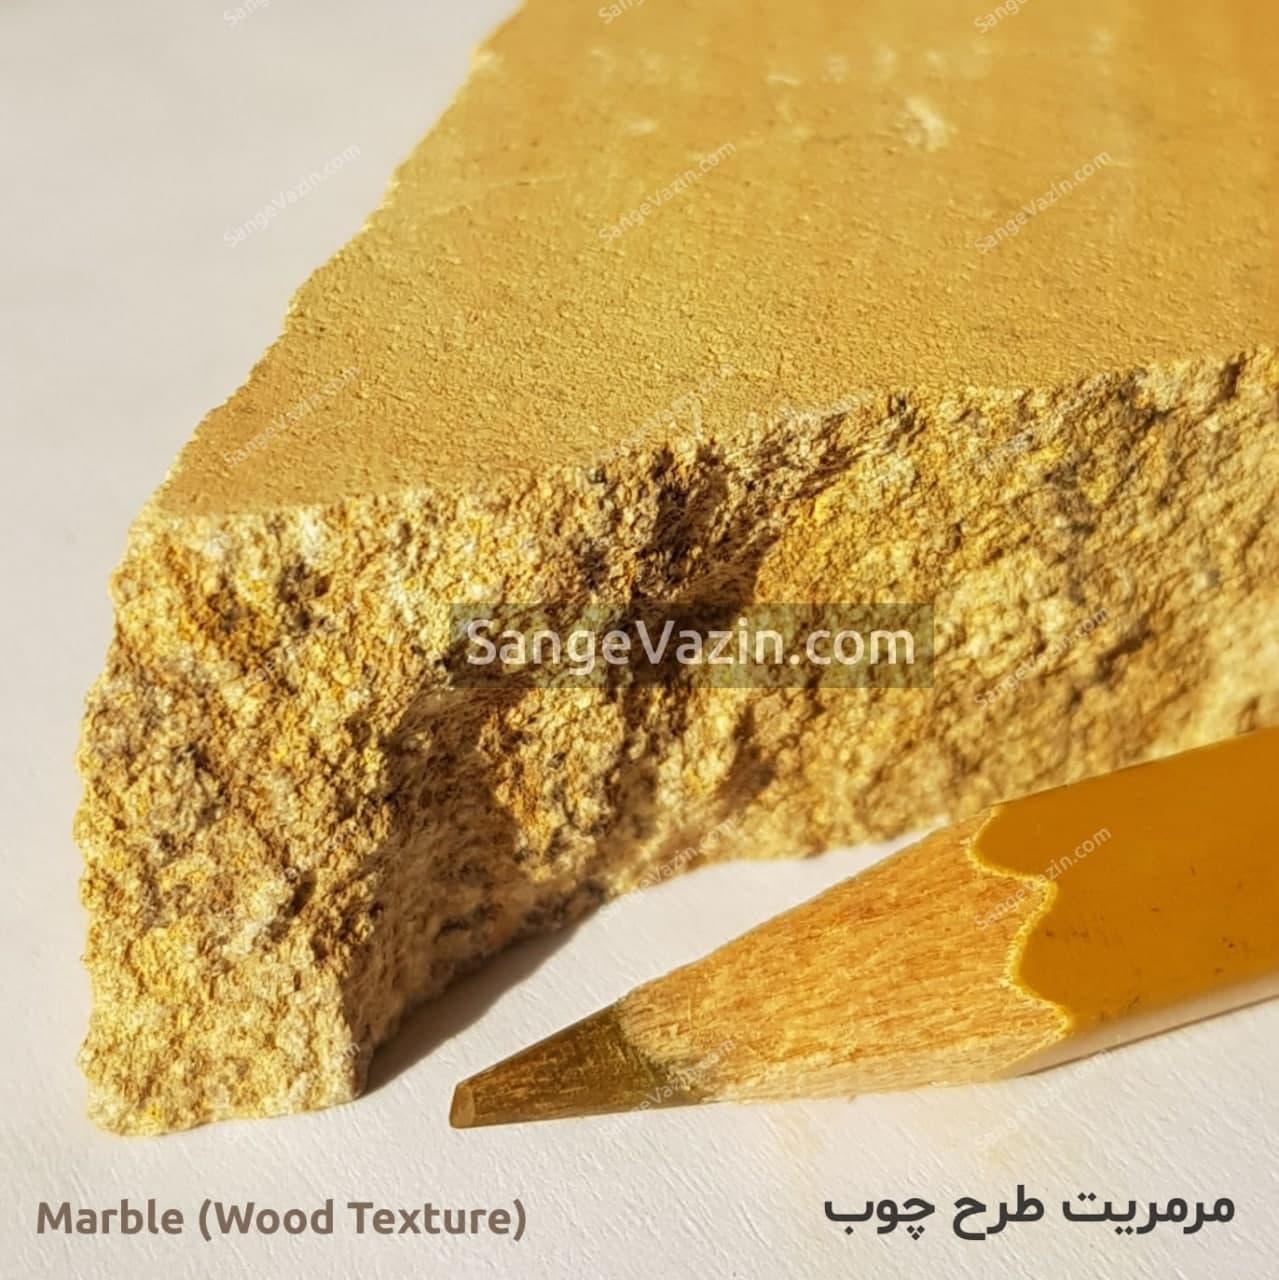 بافت سنگ مرمریت طرح چوب